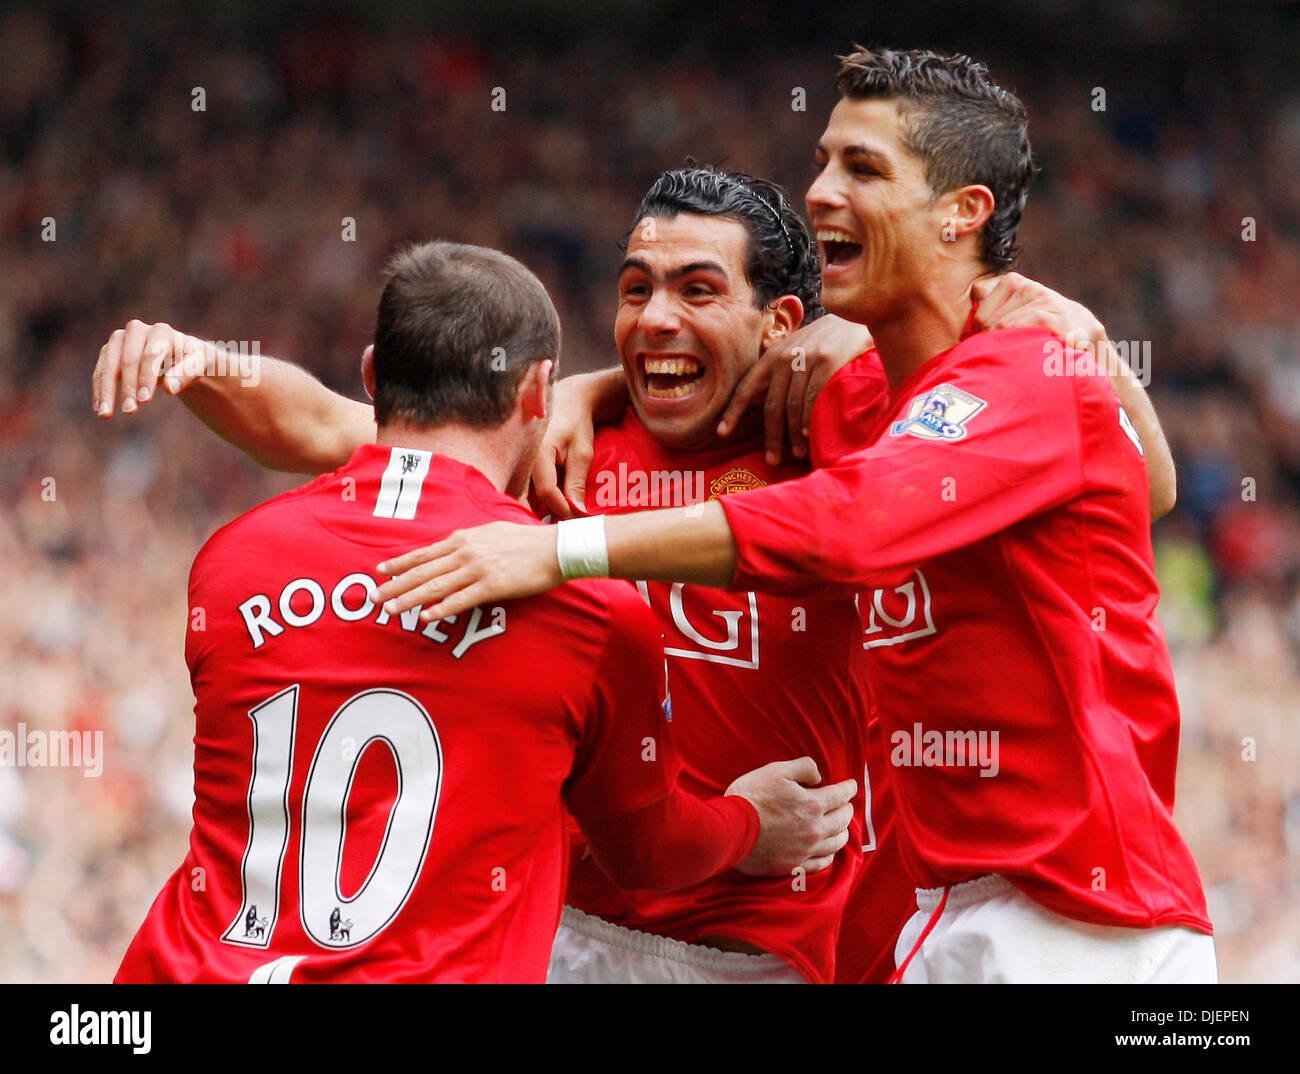 Image result for tevez manchester united